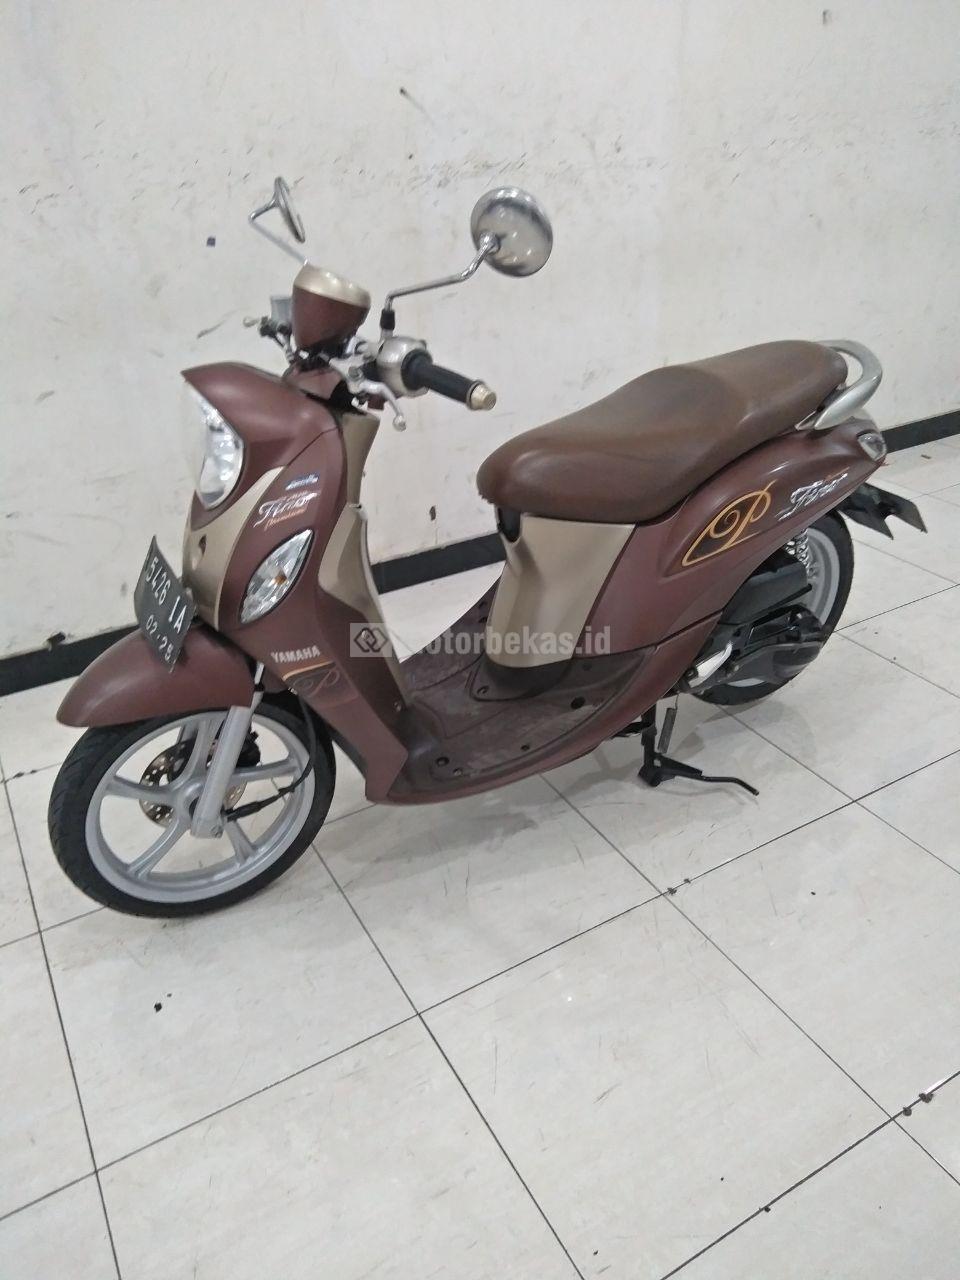 YAMAHA FINO PREMIUM  3166 motorbekas.id